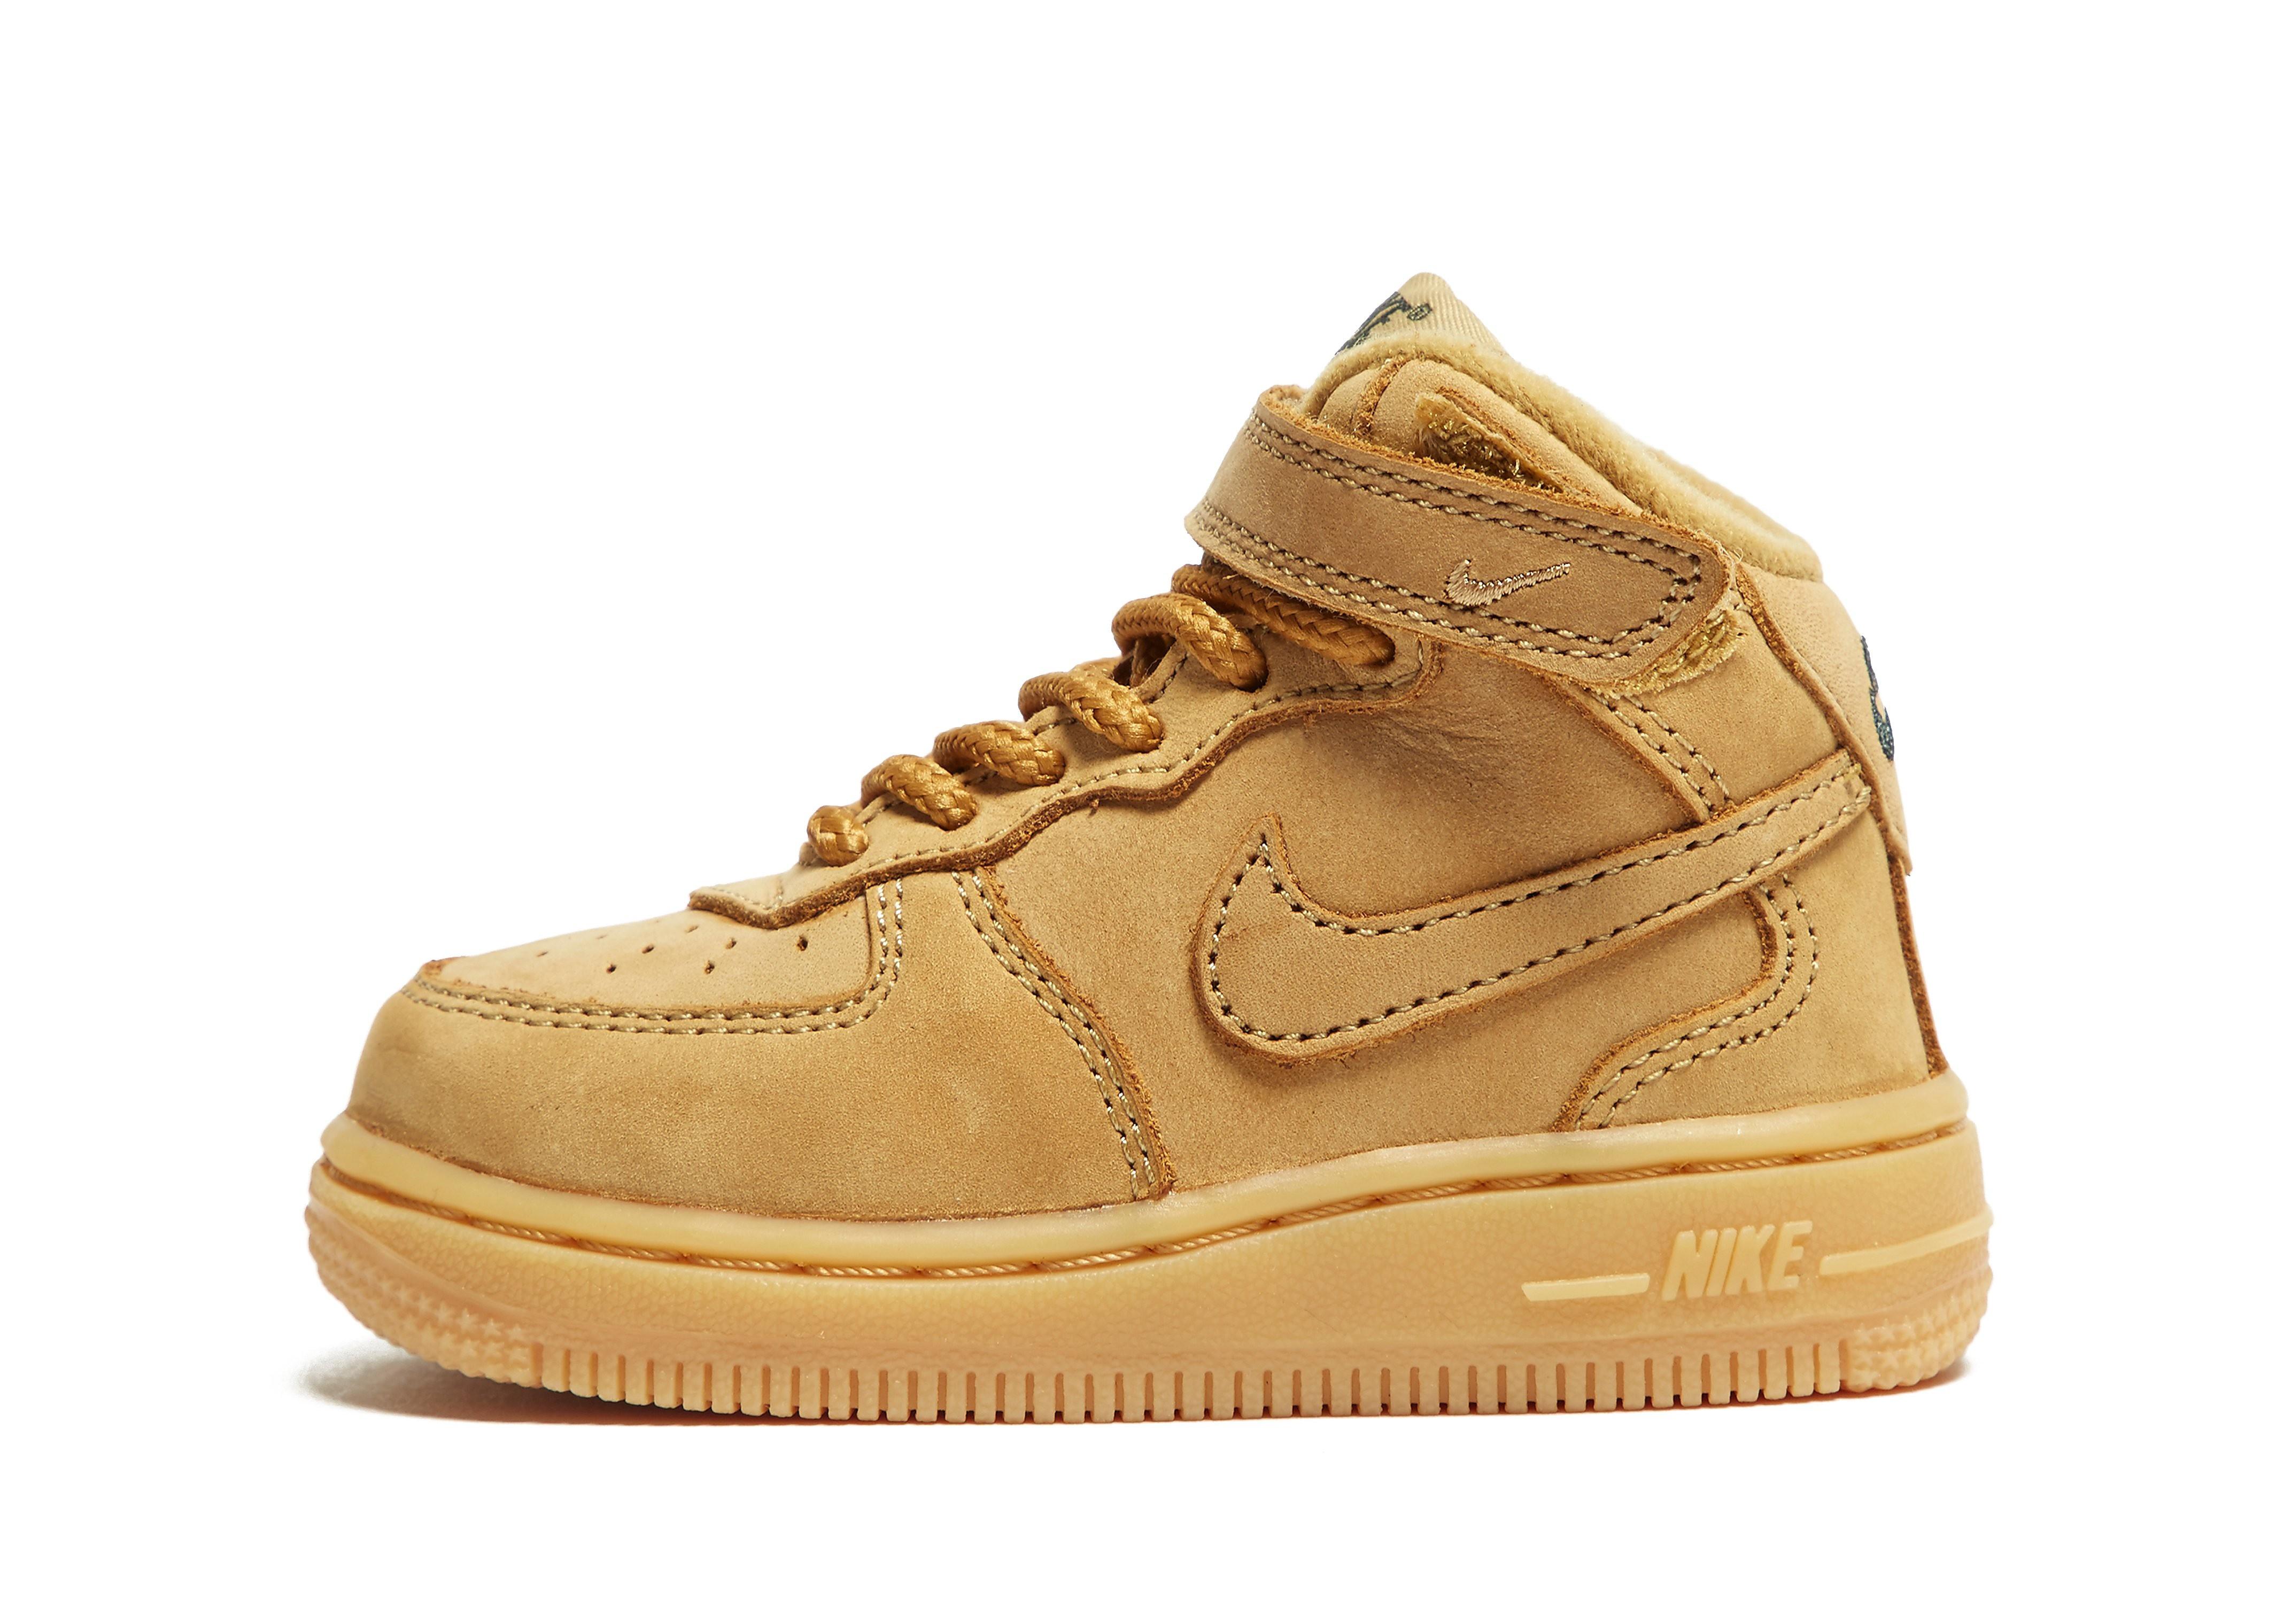 Nike Air Force 1 High WB Kleinkinder